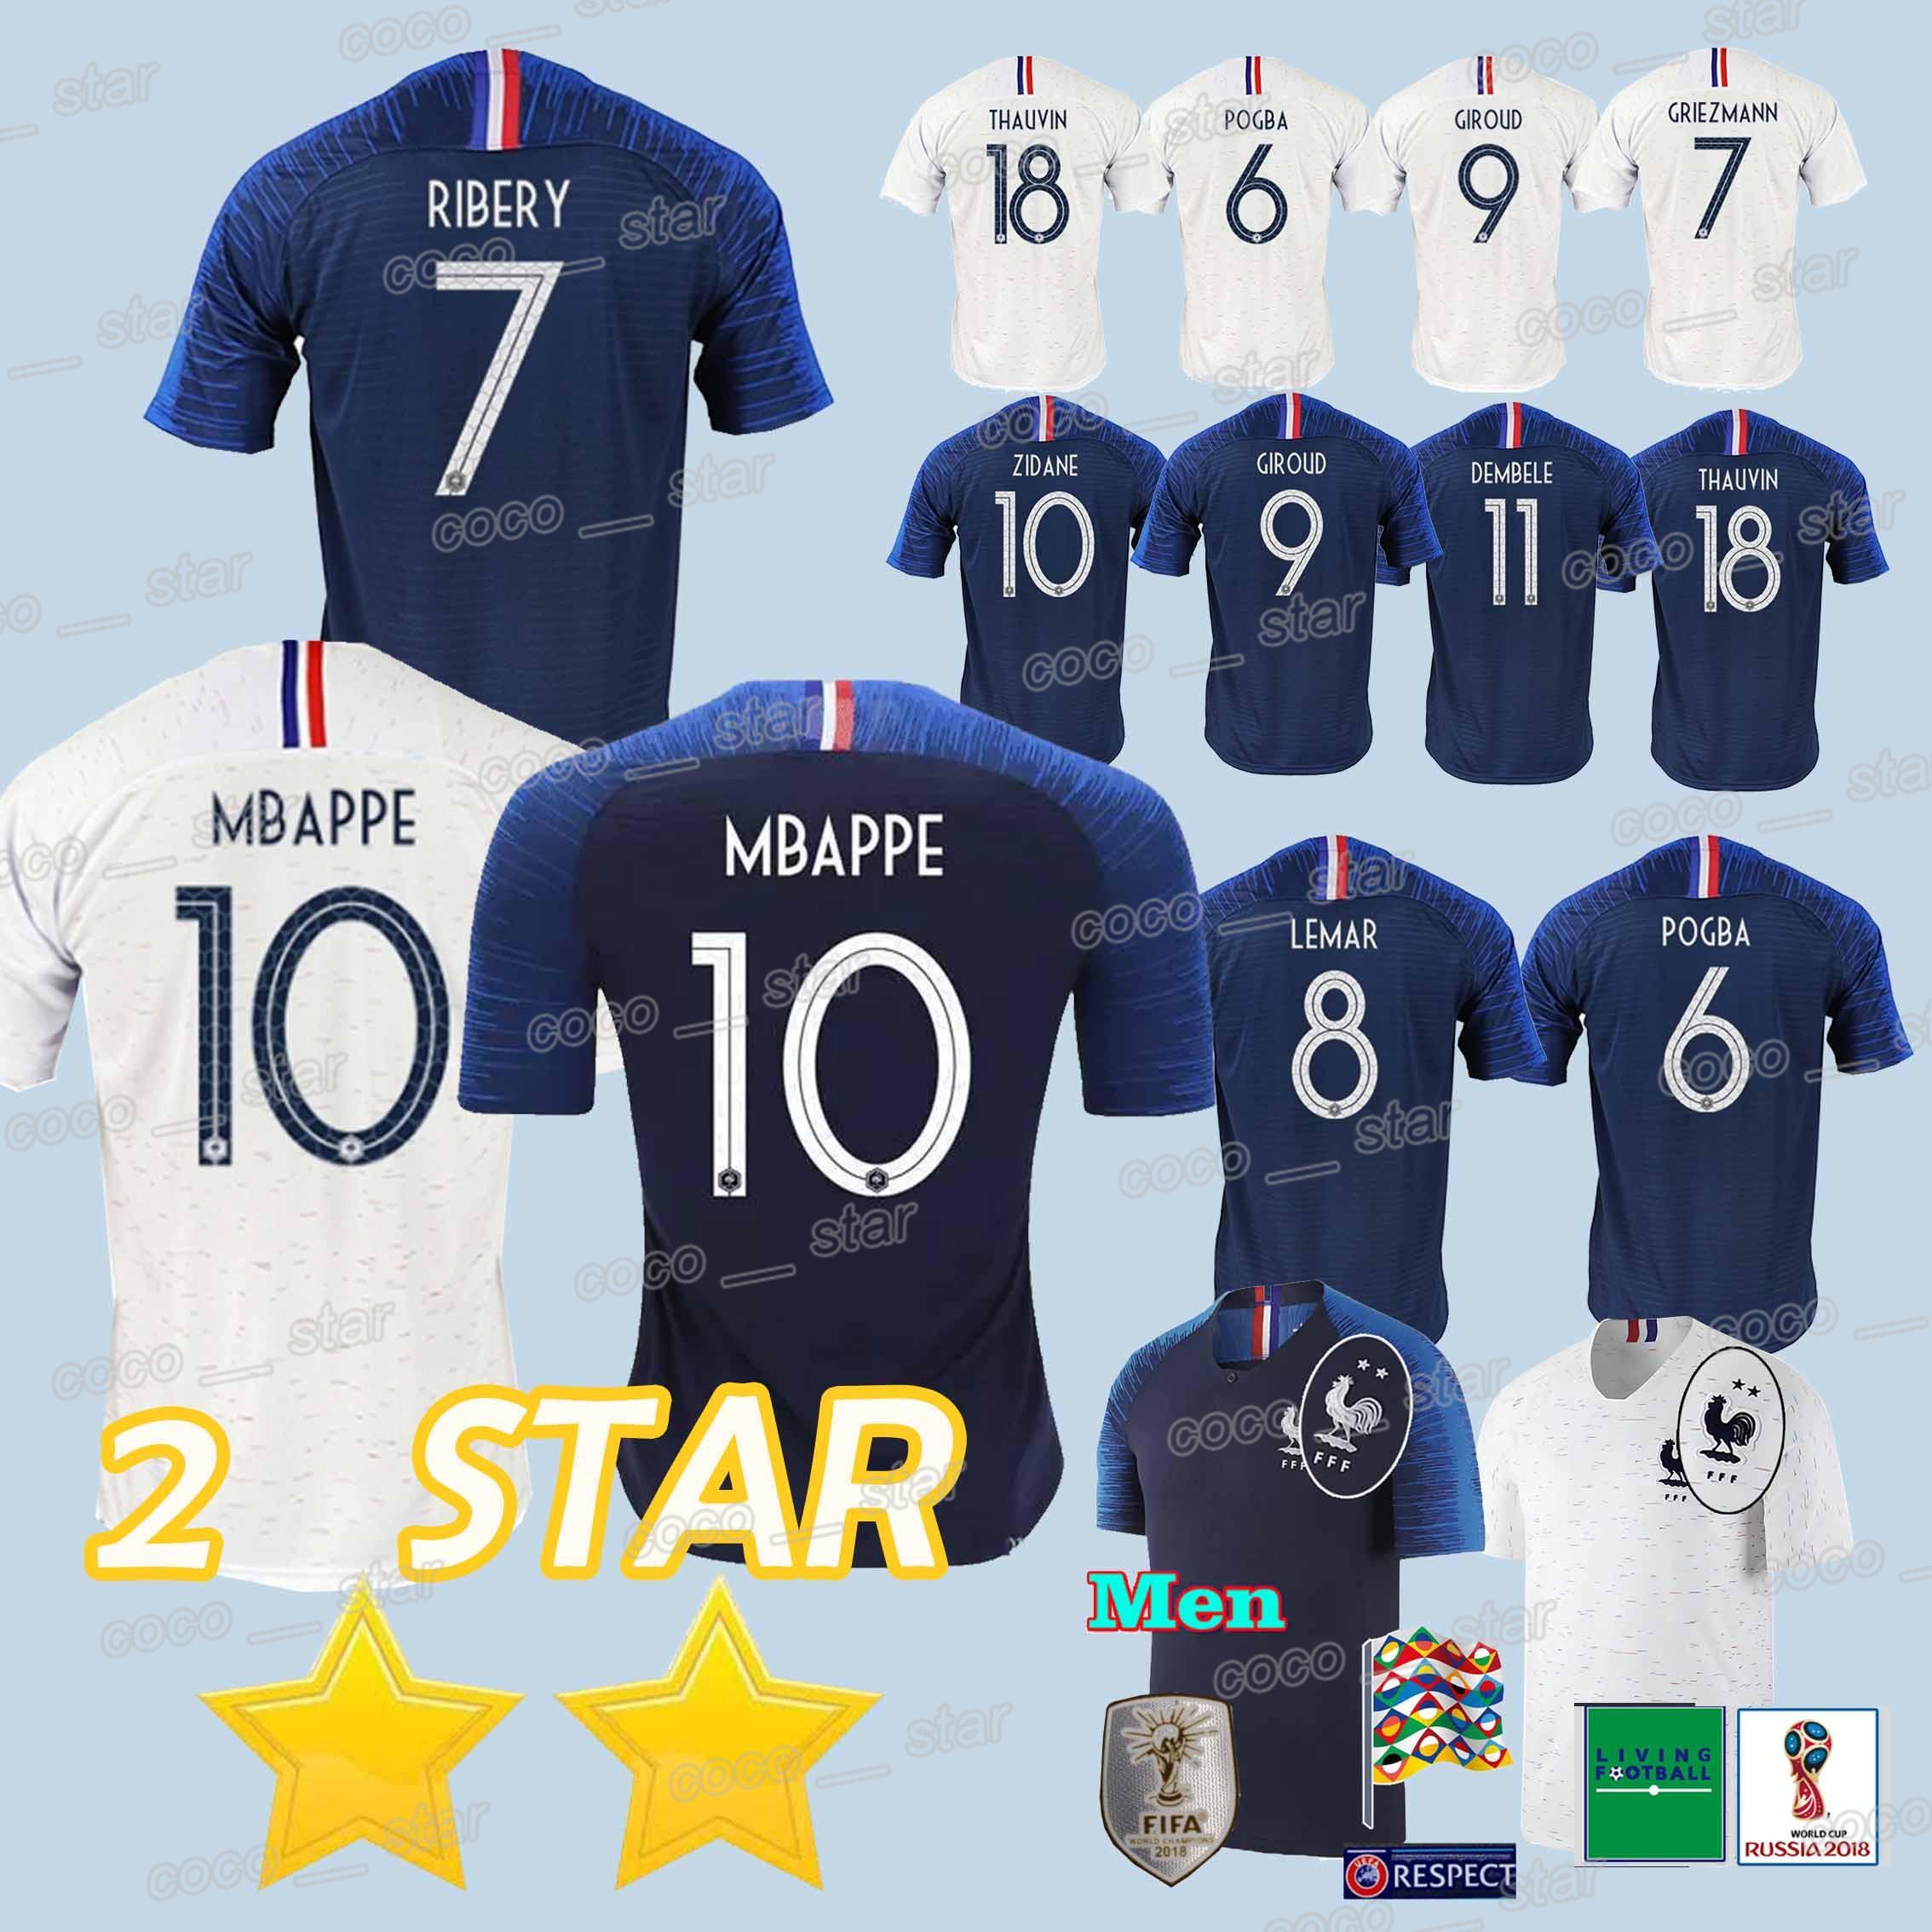 new styles 93142 c1c1e 2018 world cup MBAPPE POGBA GRIEZMANN soccer jersey DEMBELE MARTIAL KANTE  GIROUD new Football jerseys 2 Stars